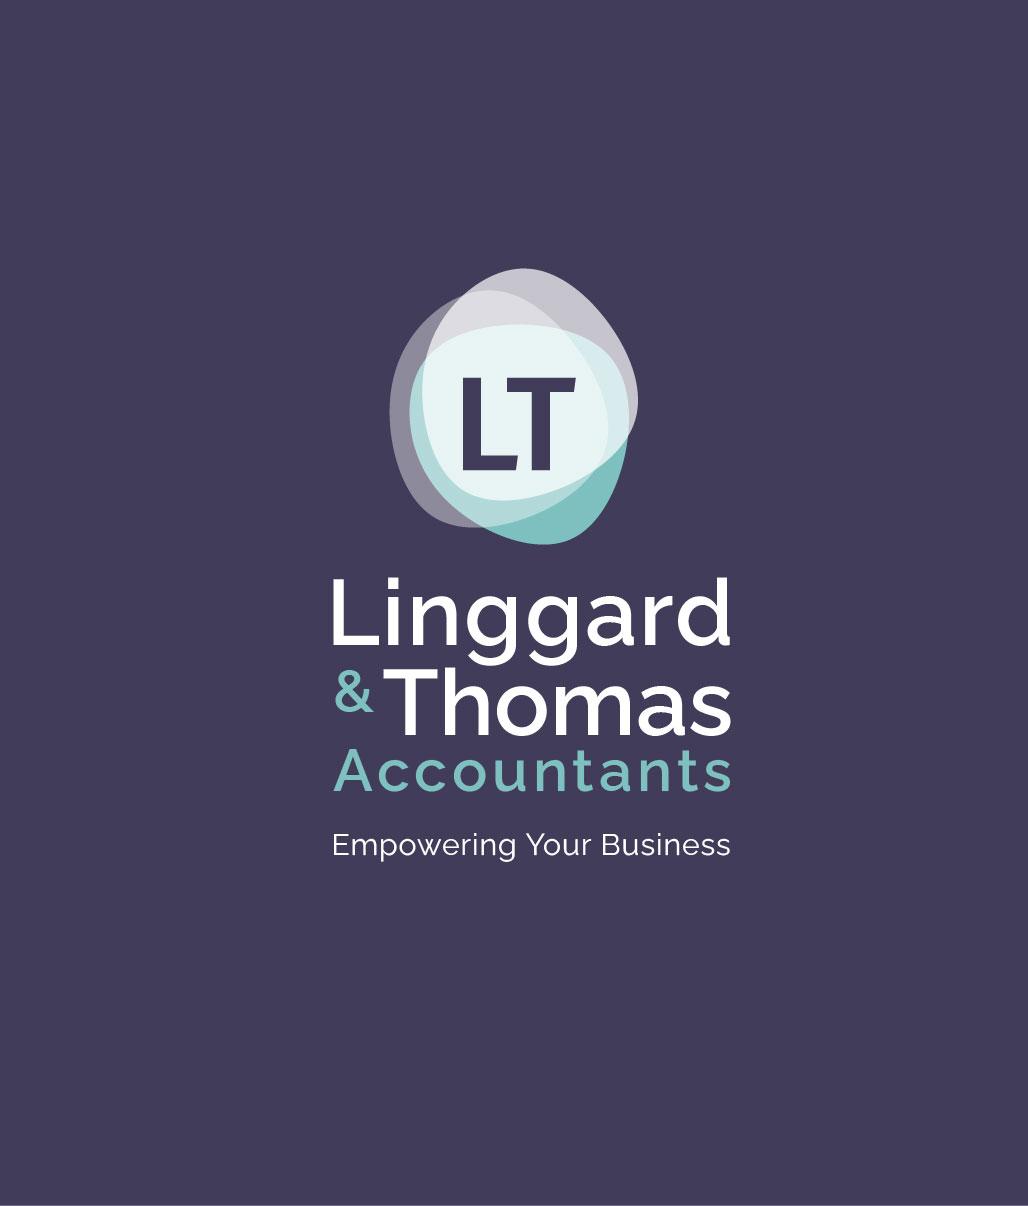 Linggard & Thomas Accountants